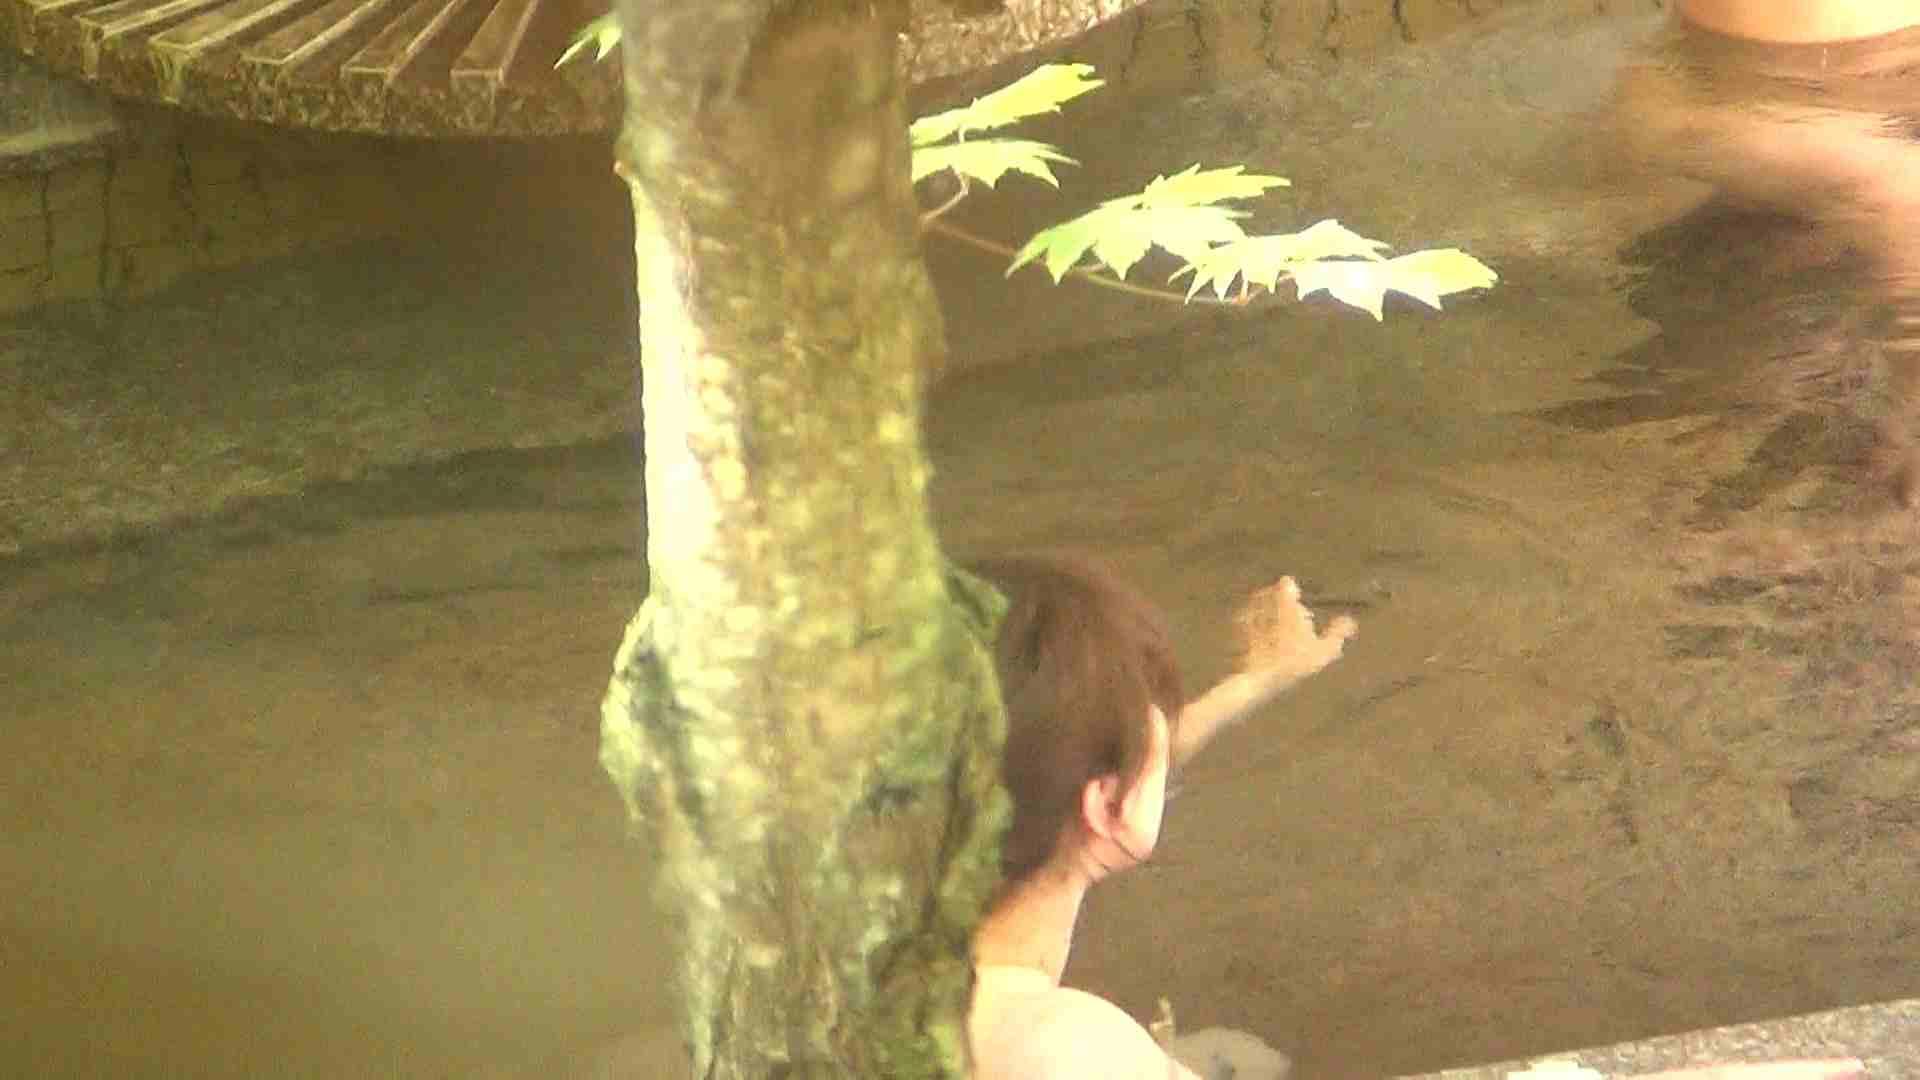 Aquaな露天風呂Vol.245 女体盗撮 | OL女体  46連発 7